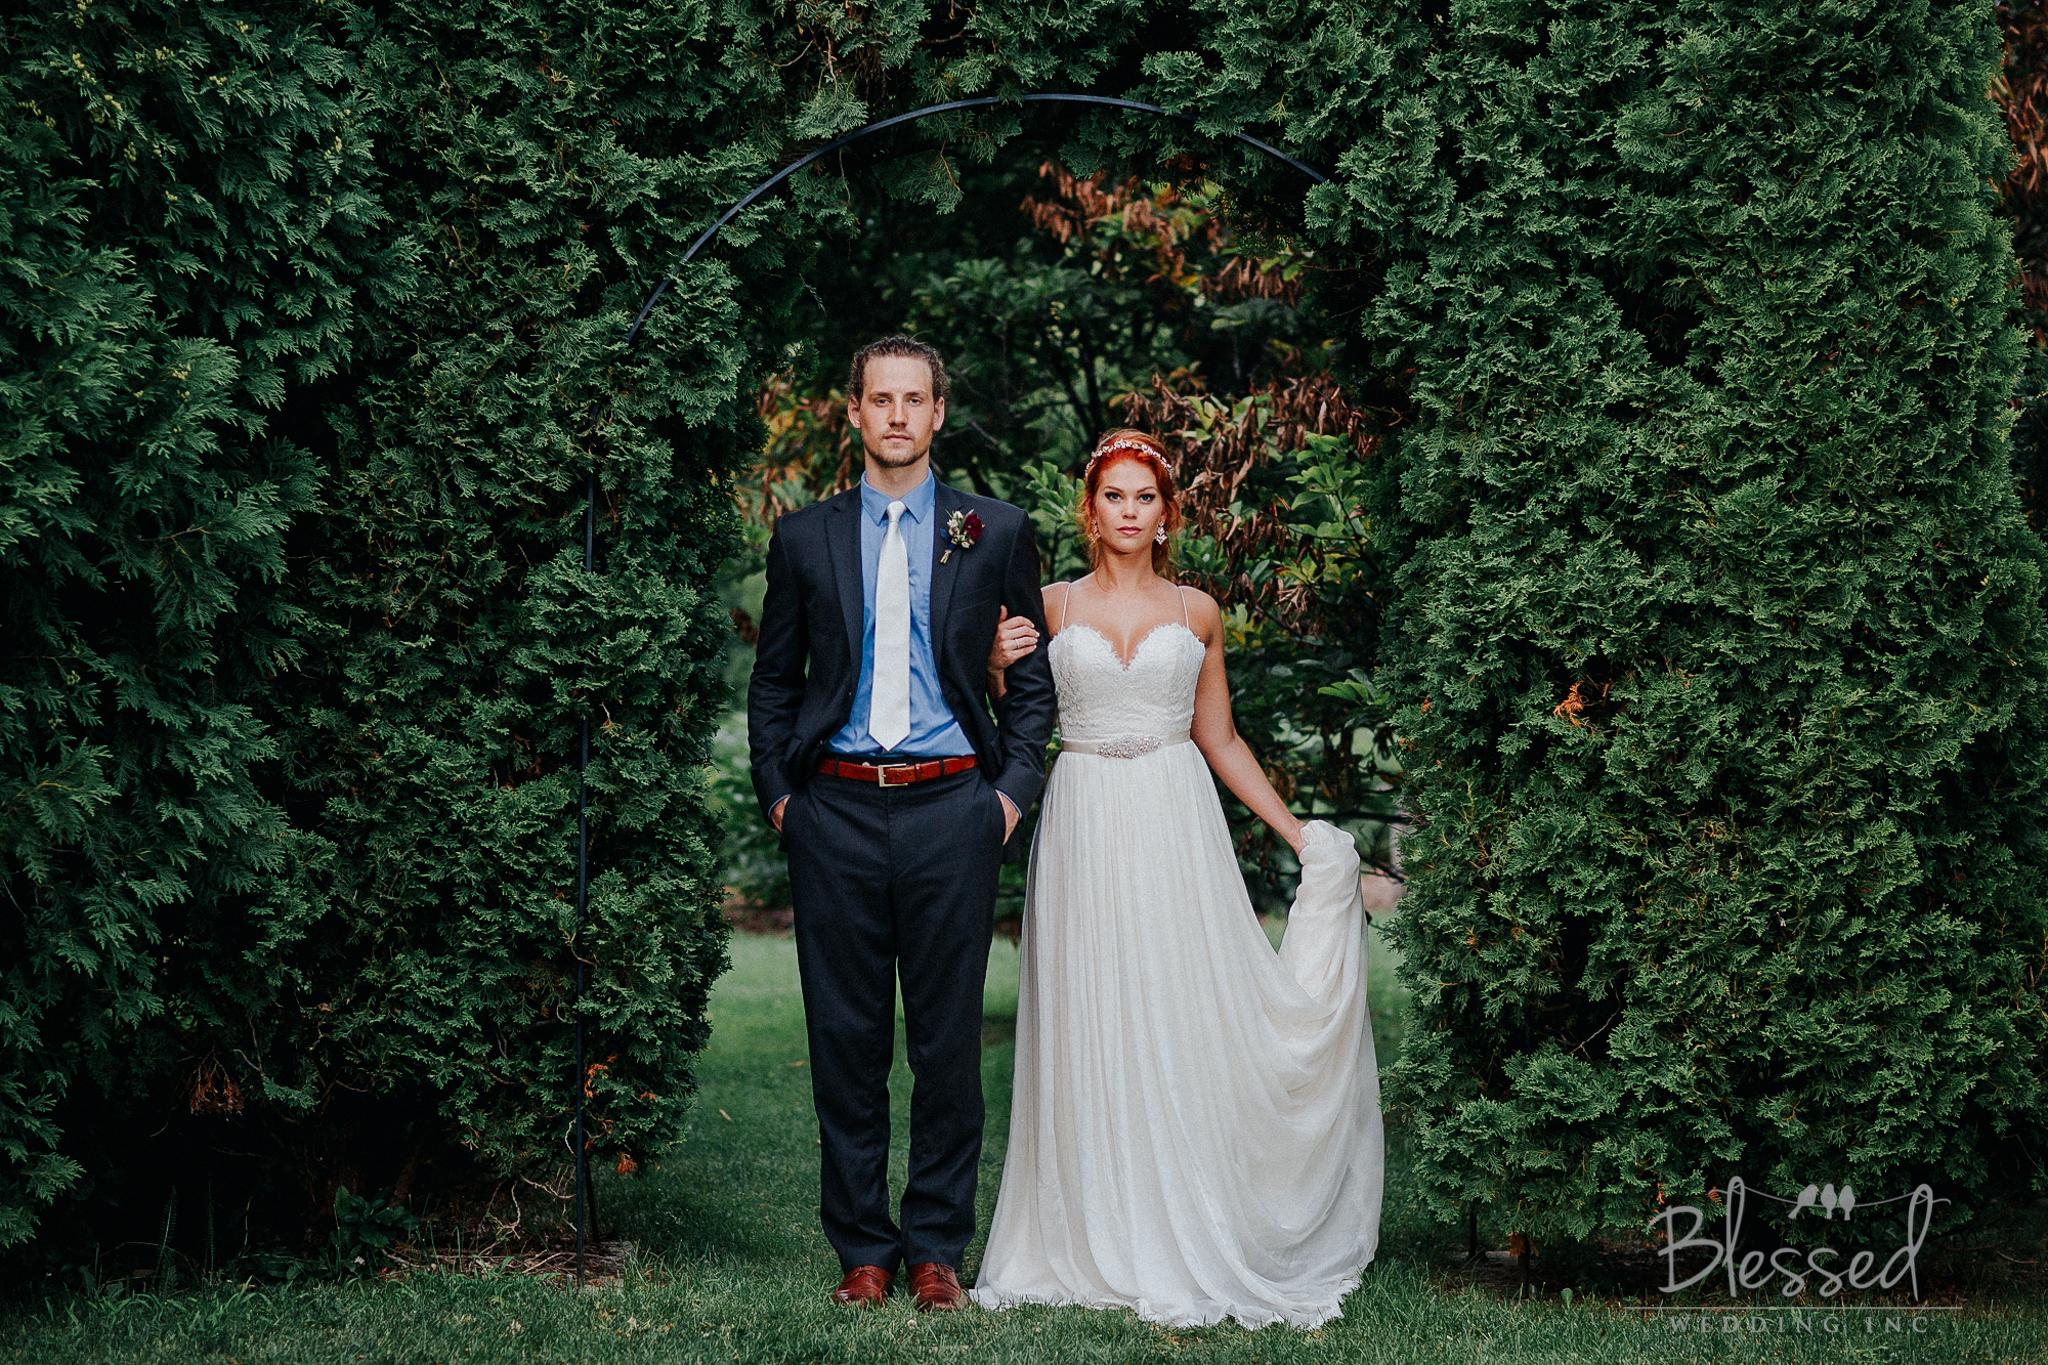 Destination Wedding Photography Minnesota By Blessed Wedding Photographers-47.jpg